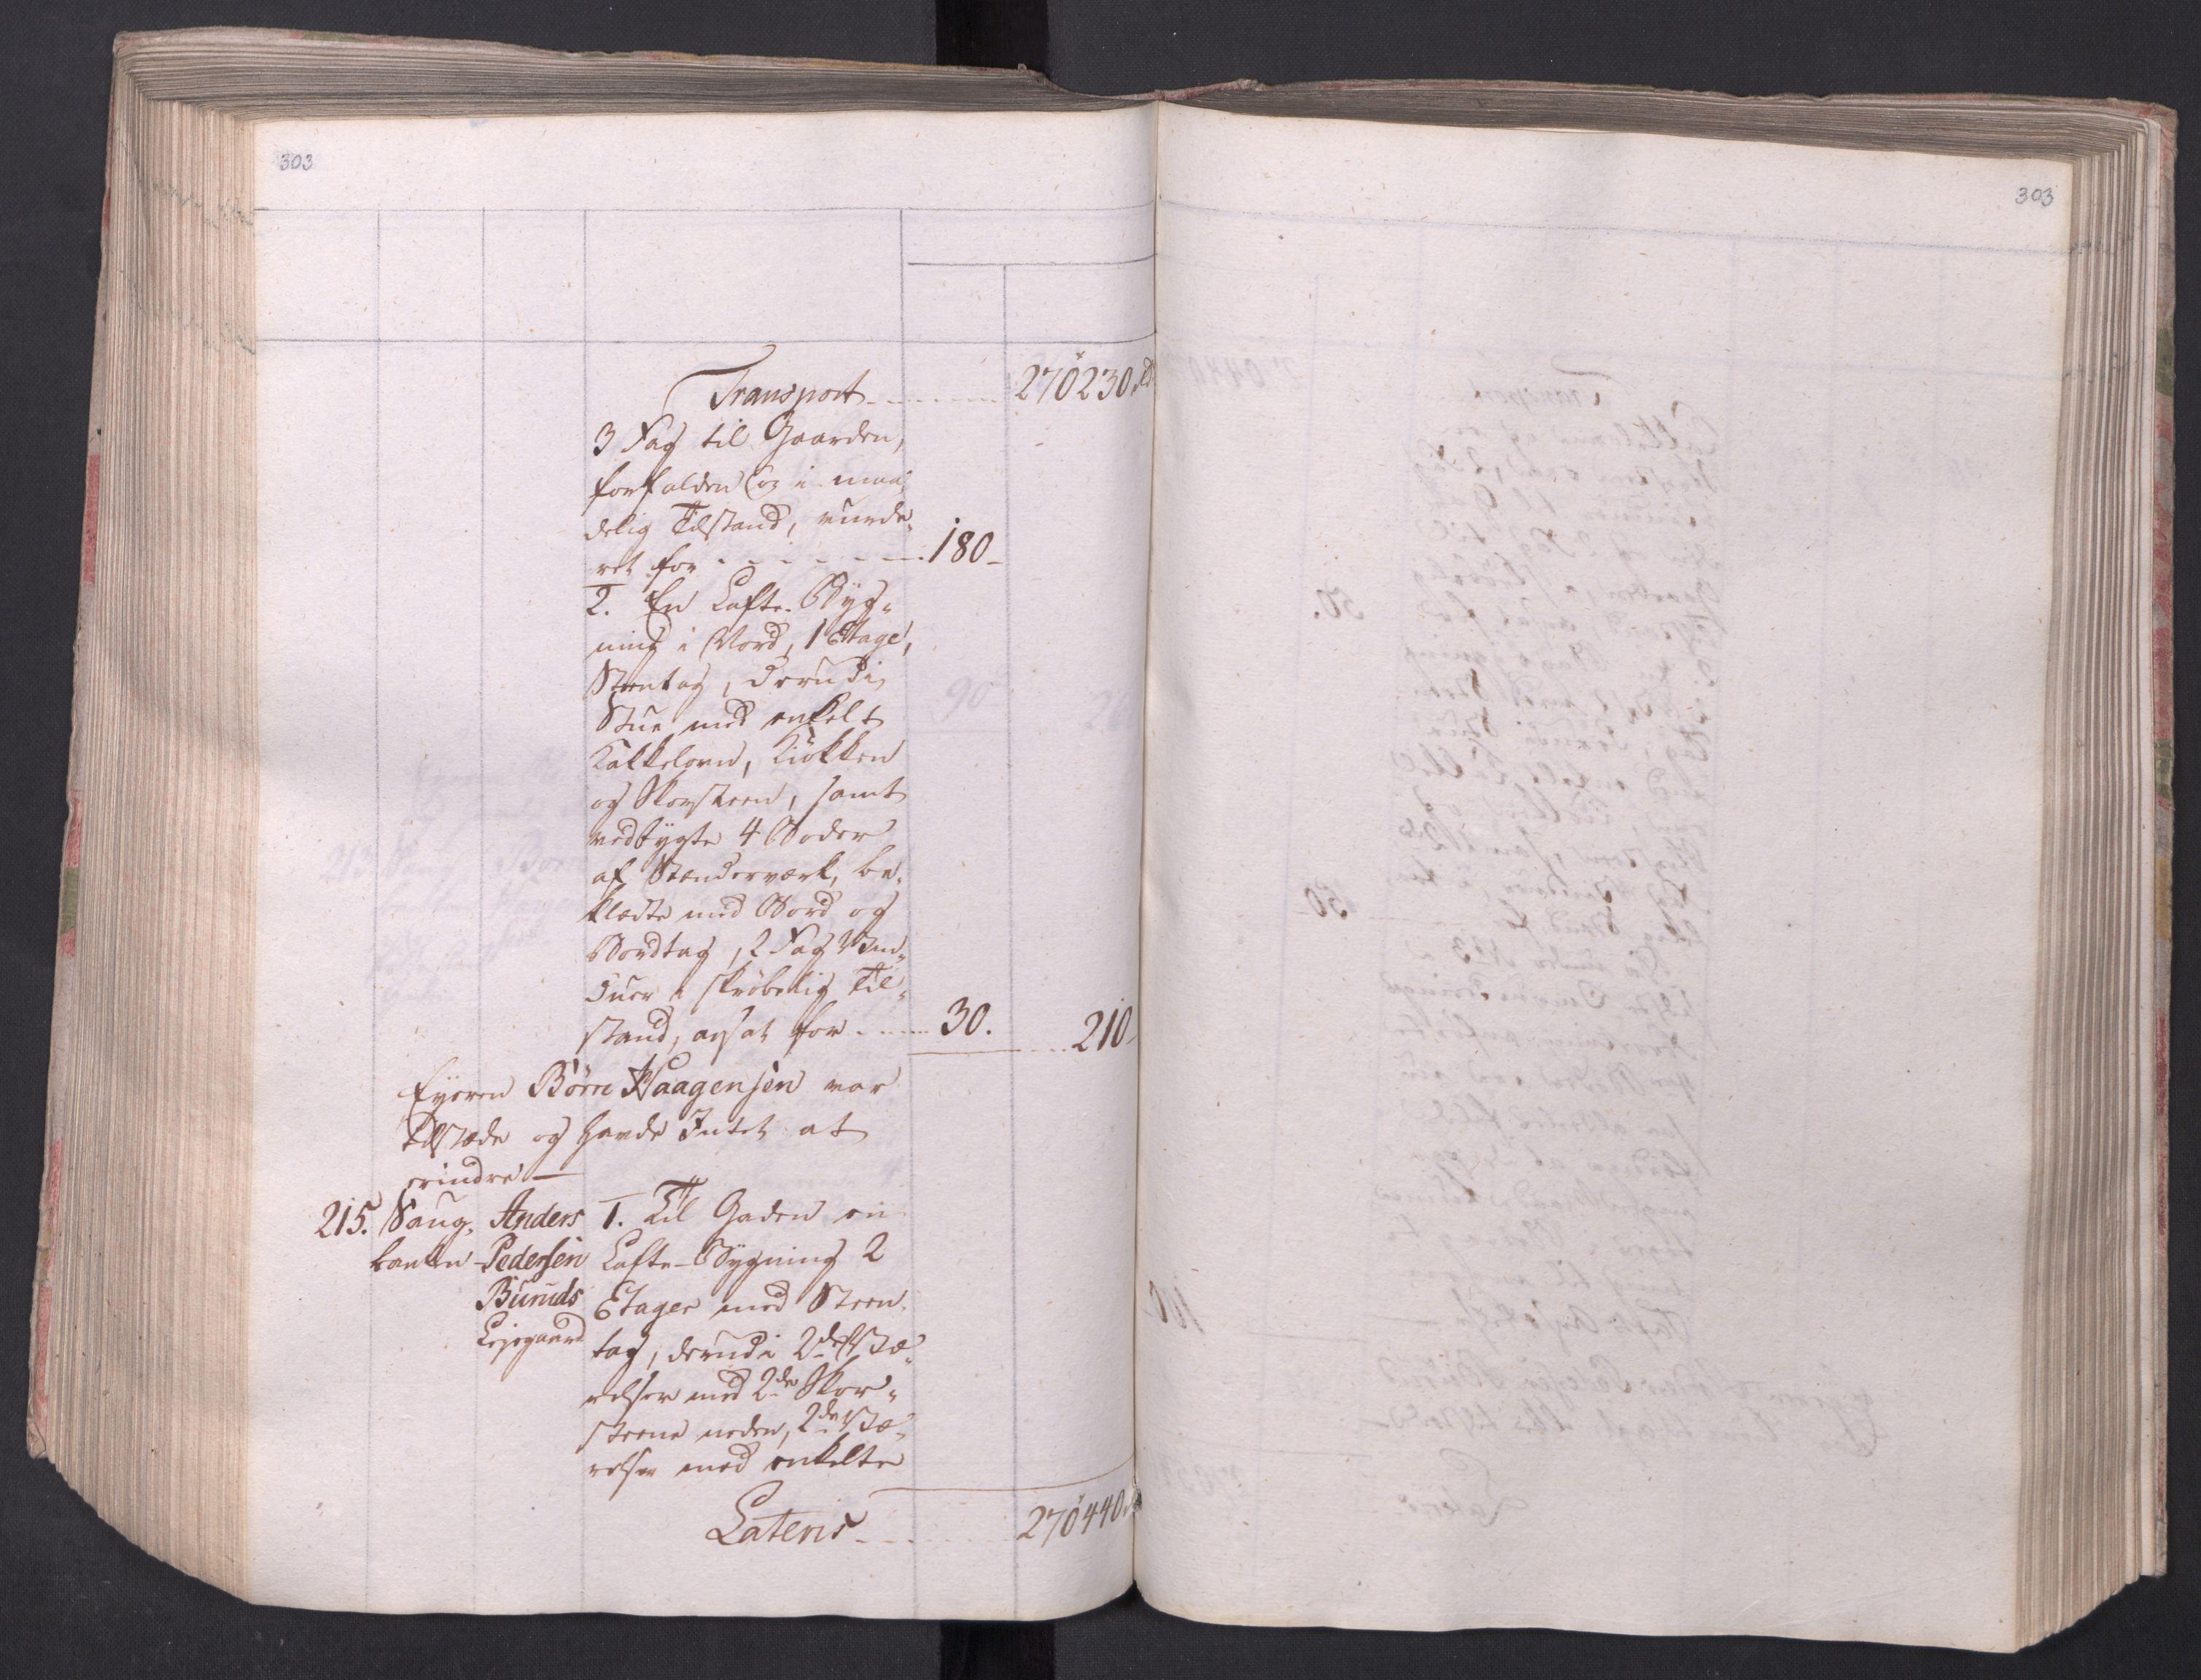 SAO, Kristiania stiftamt, I/Ia/L0015: Branntakster, 1797, s. 303